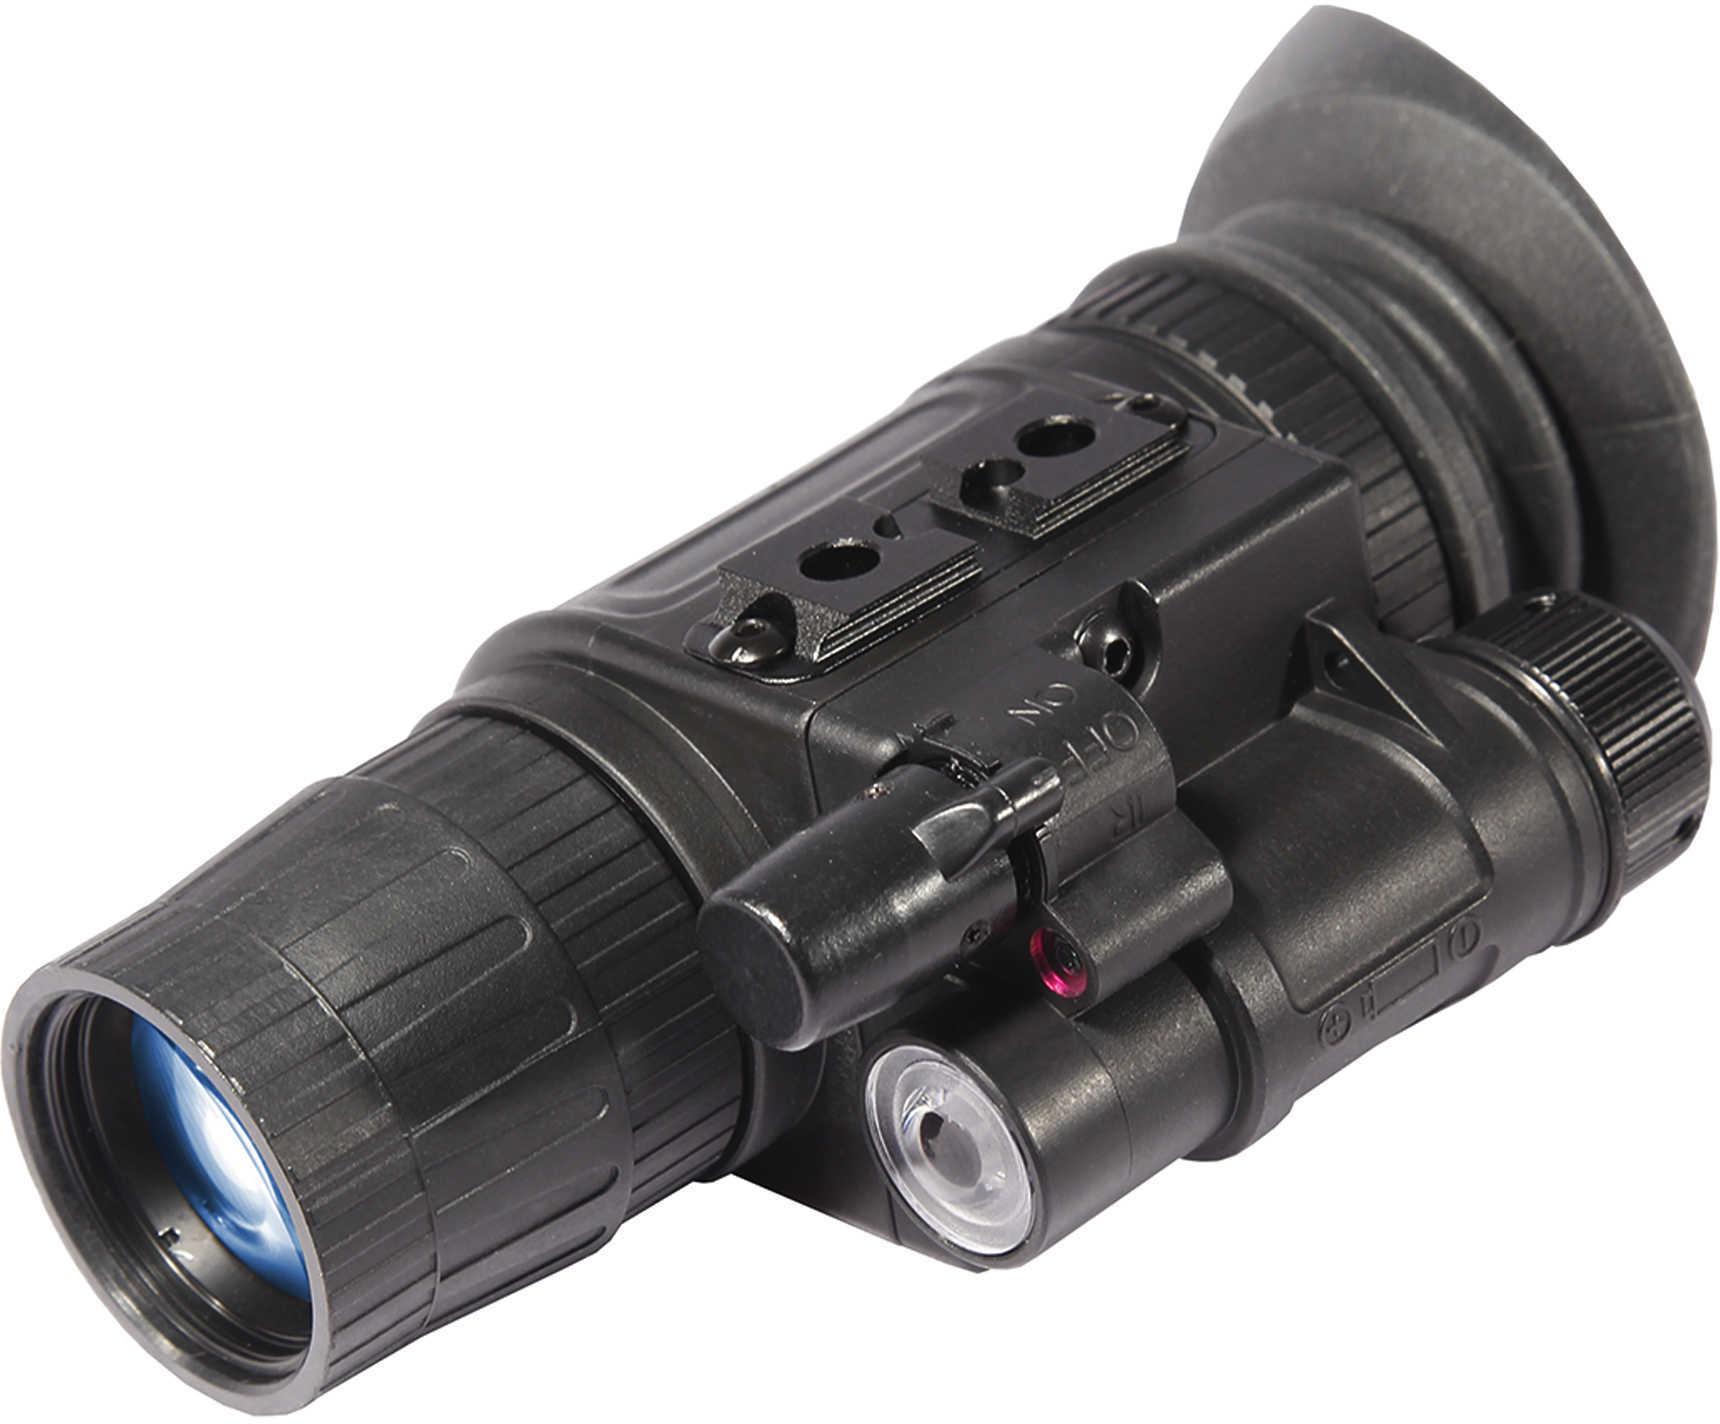 ATN NVM14-3 Monocular Gen 3 Black Night Vision Monocular System NVMPAN1430